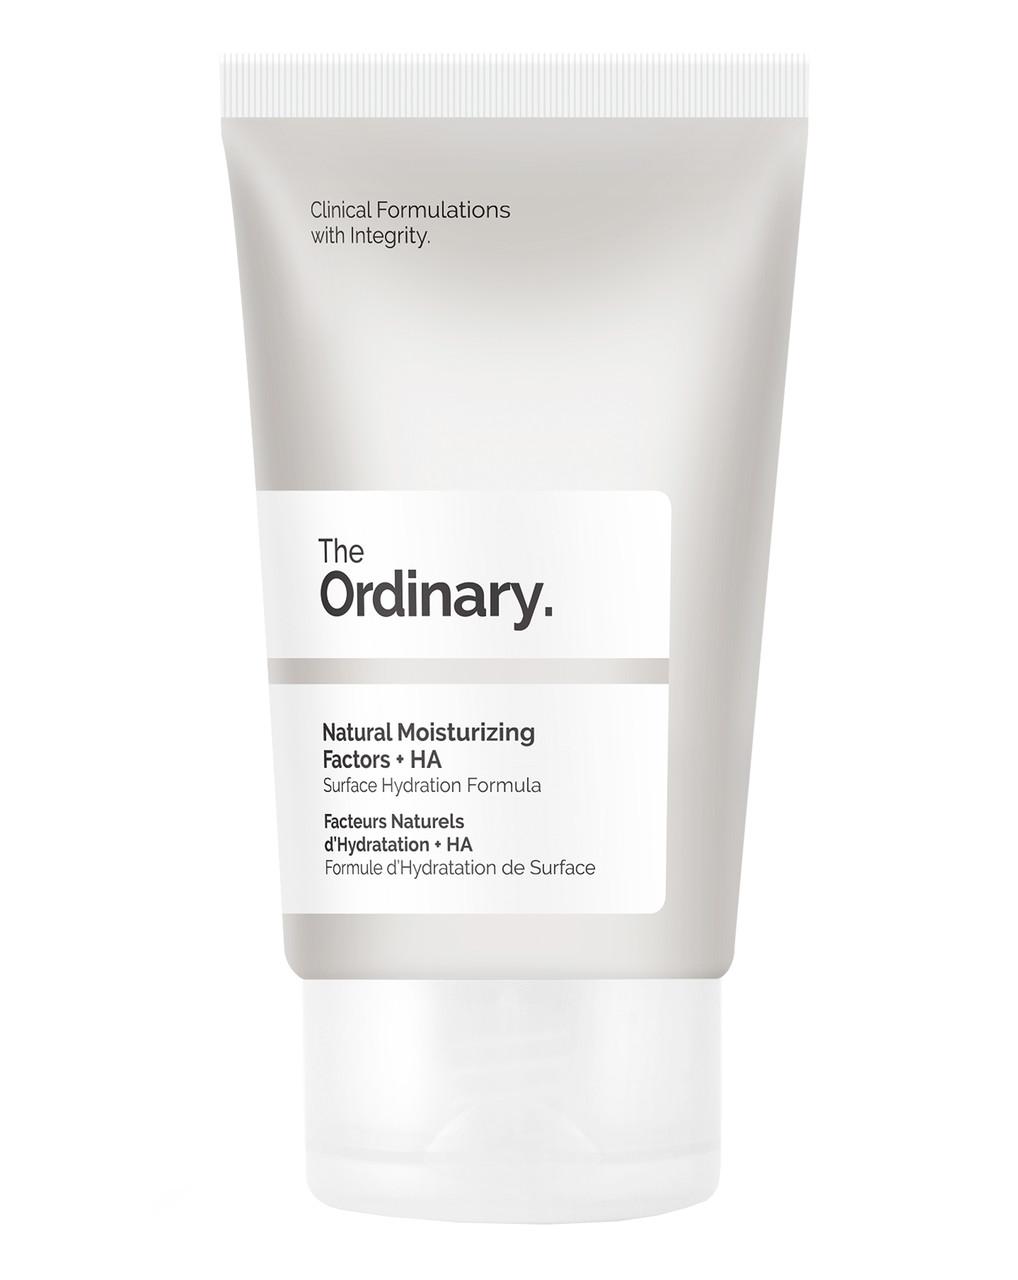 Крем для лица The Ordinary Natural Moisturizing Factors + HA 30 мл